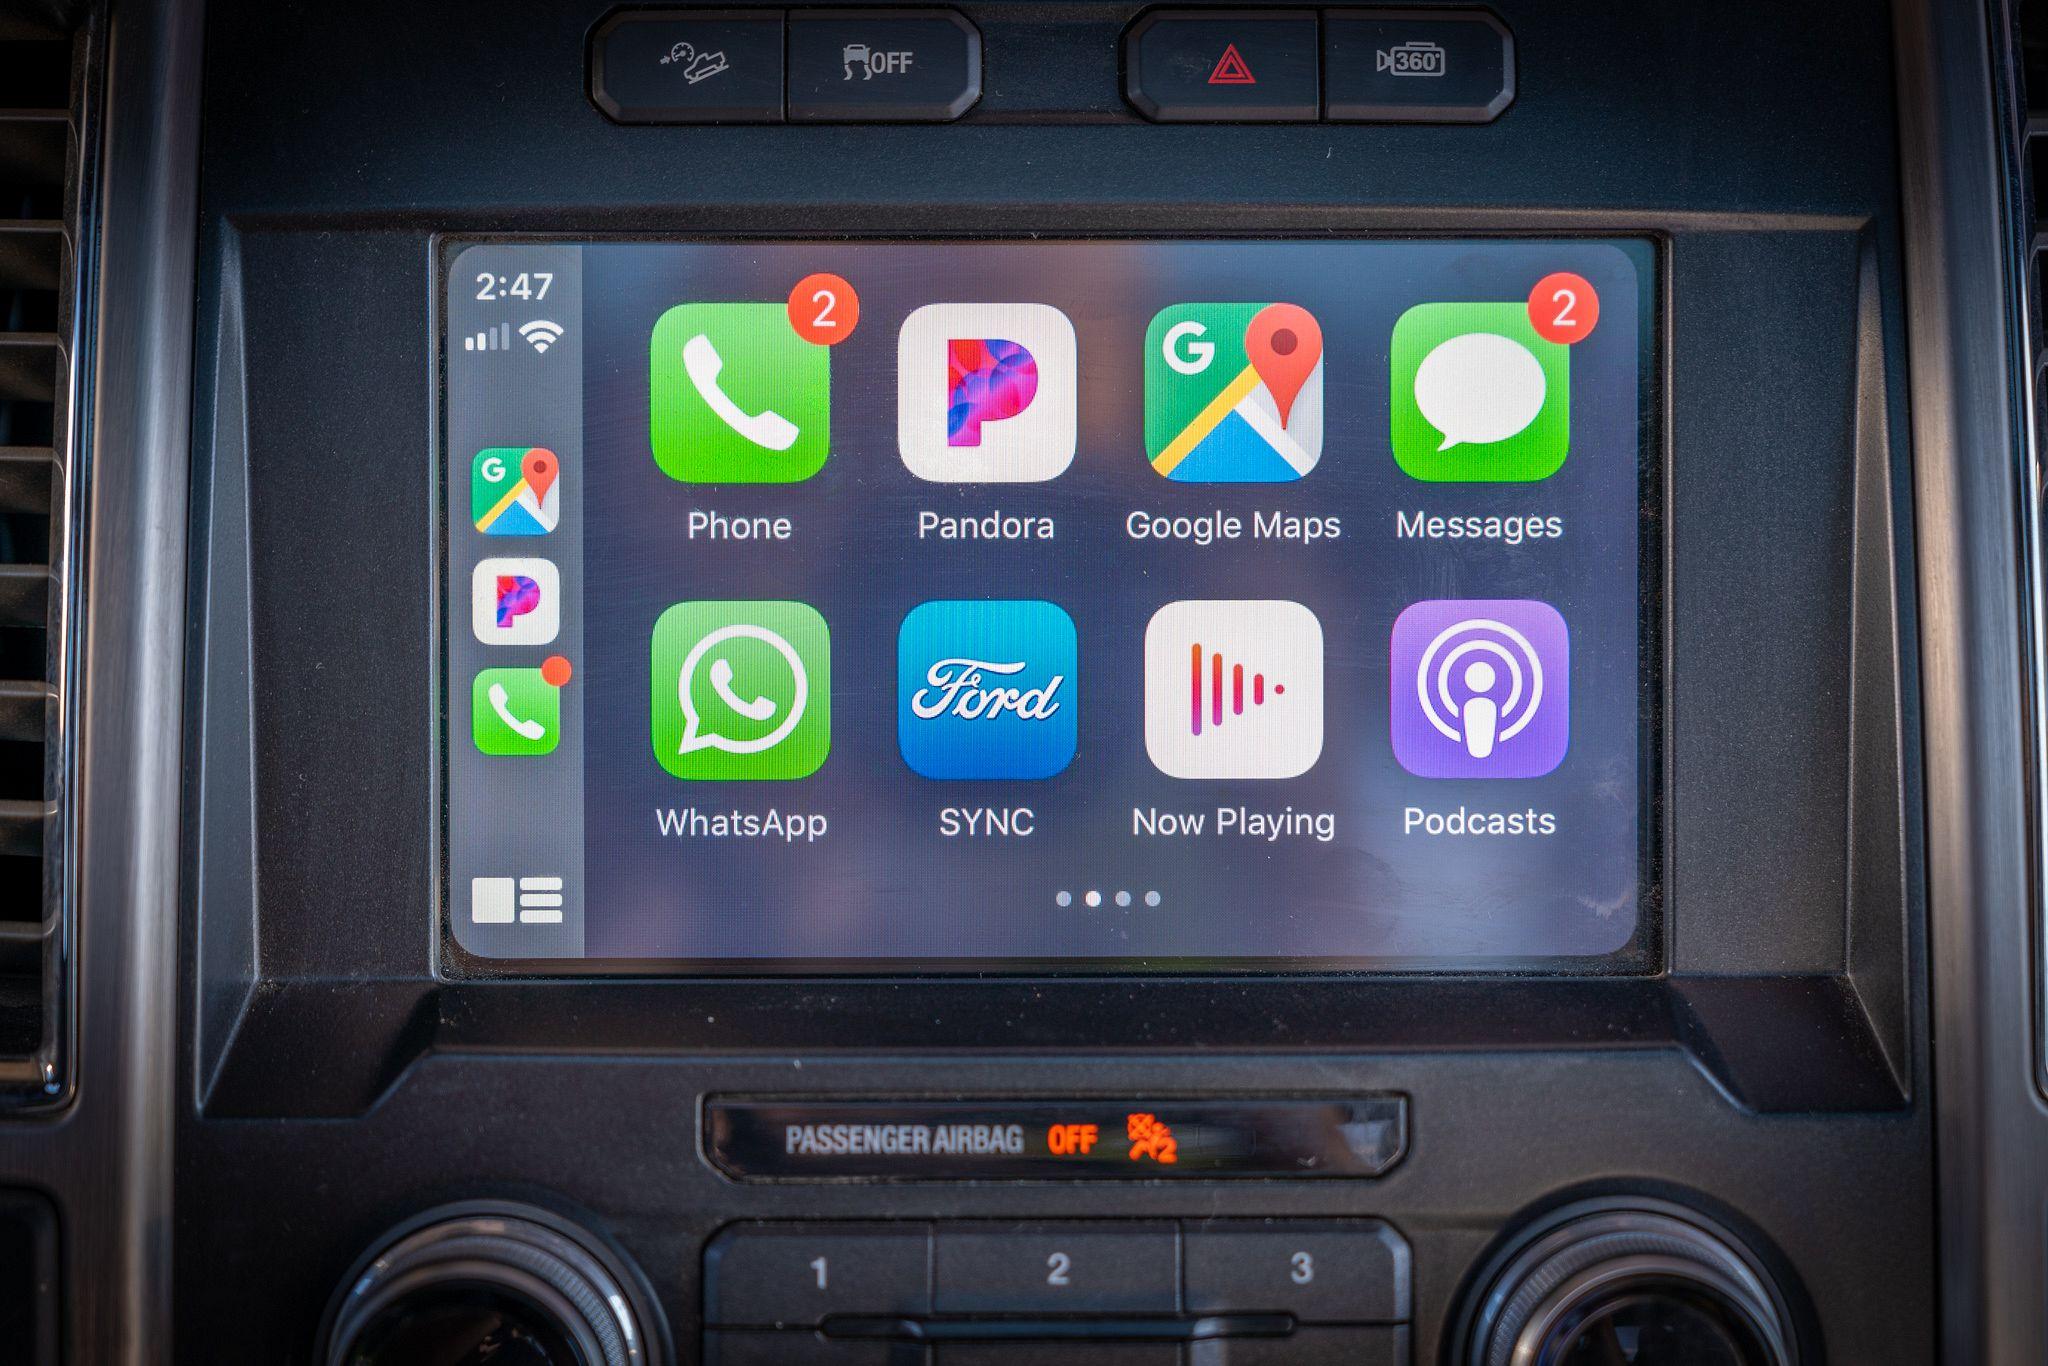 Apple CarPlay in a Ford F-150